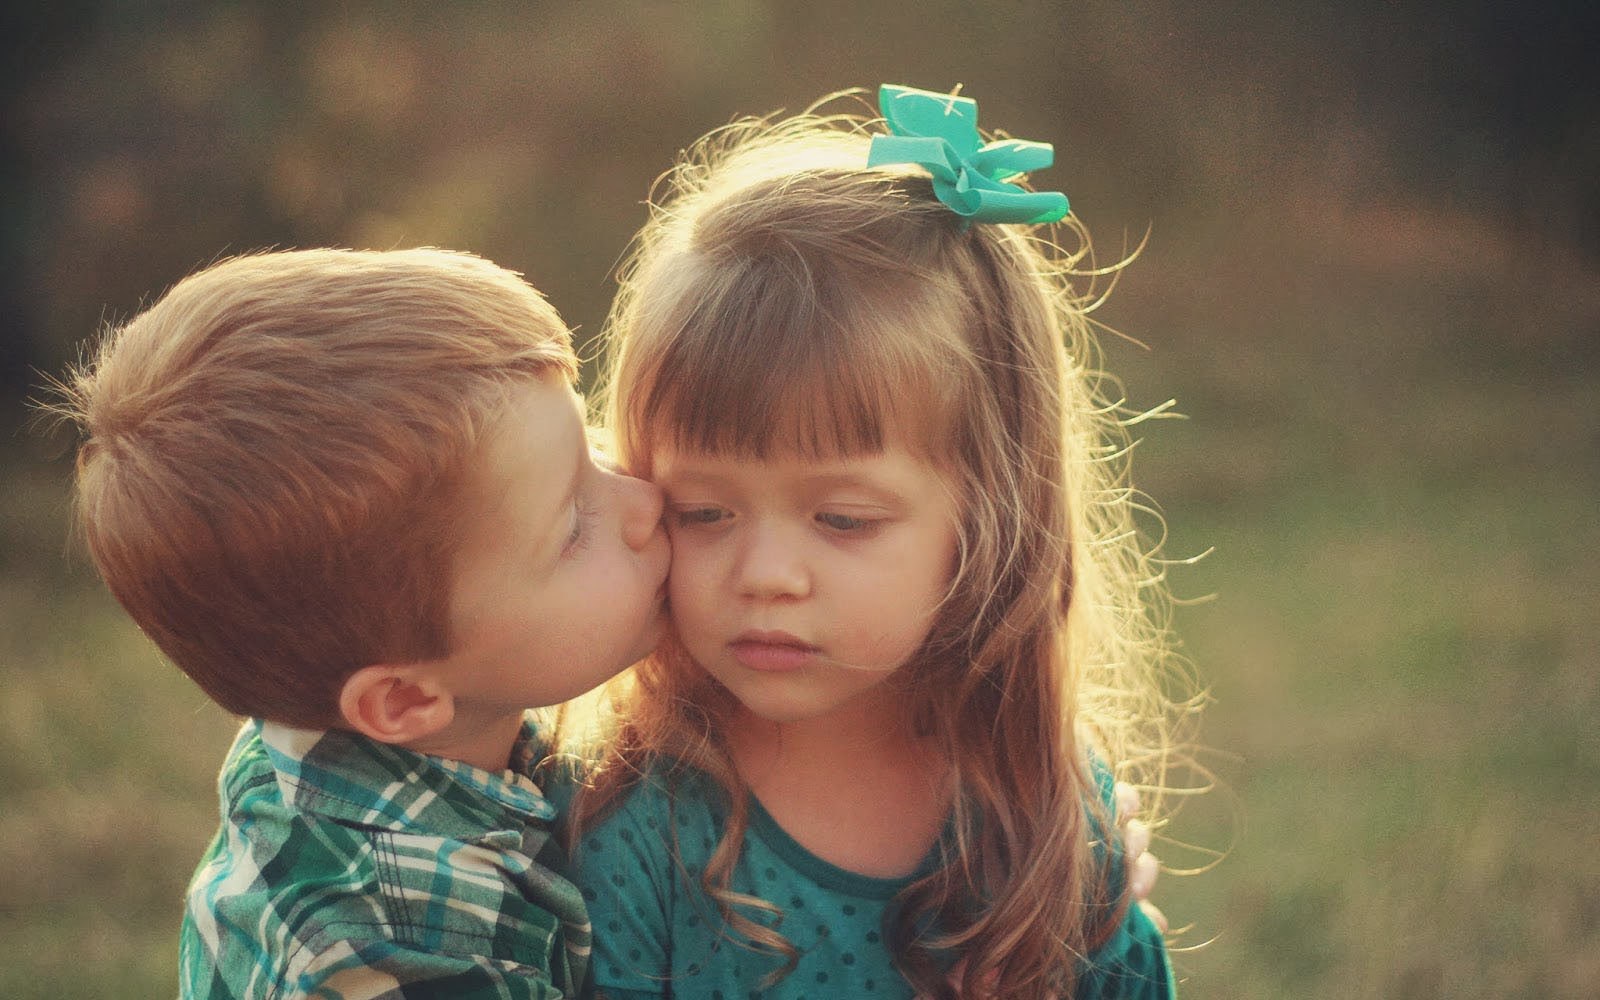 Anak Kecil Romantis Ban Nusagates